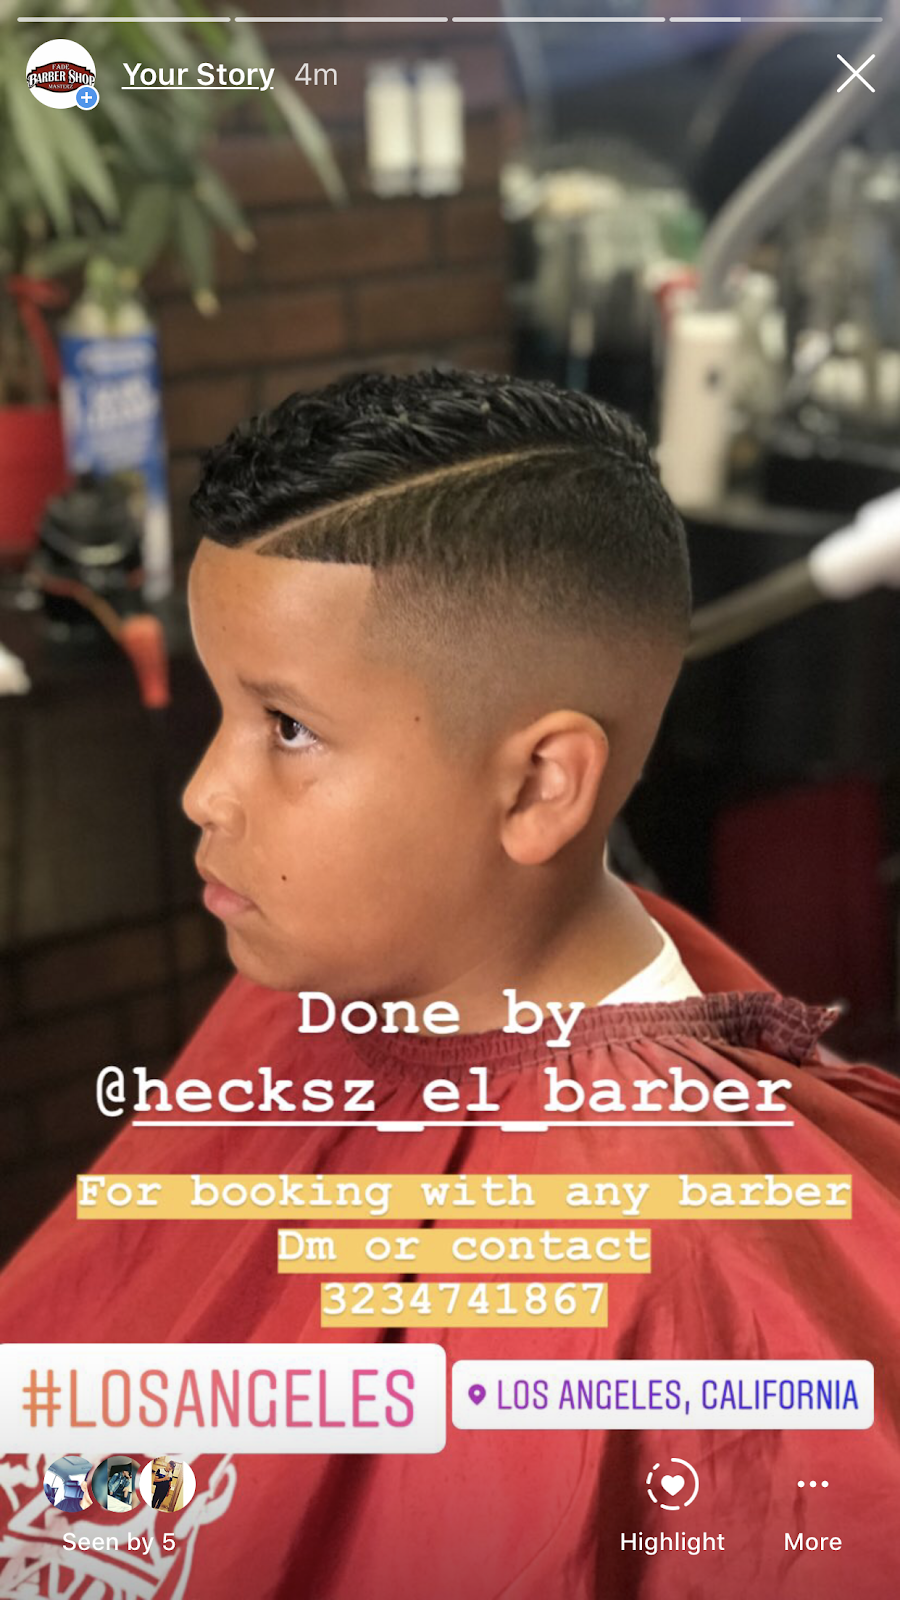 Fade Masterz Barbershop - hair care  | Photo 9 of 10 | Address: 4027 S Main St, Los Angeles, CA 90037, USA | Phone: (323) 474-1867